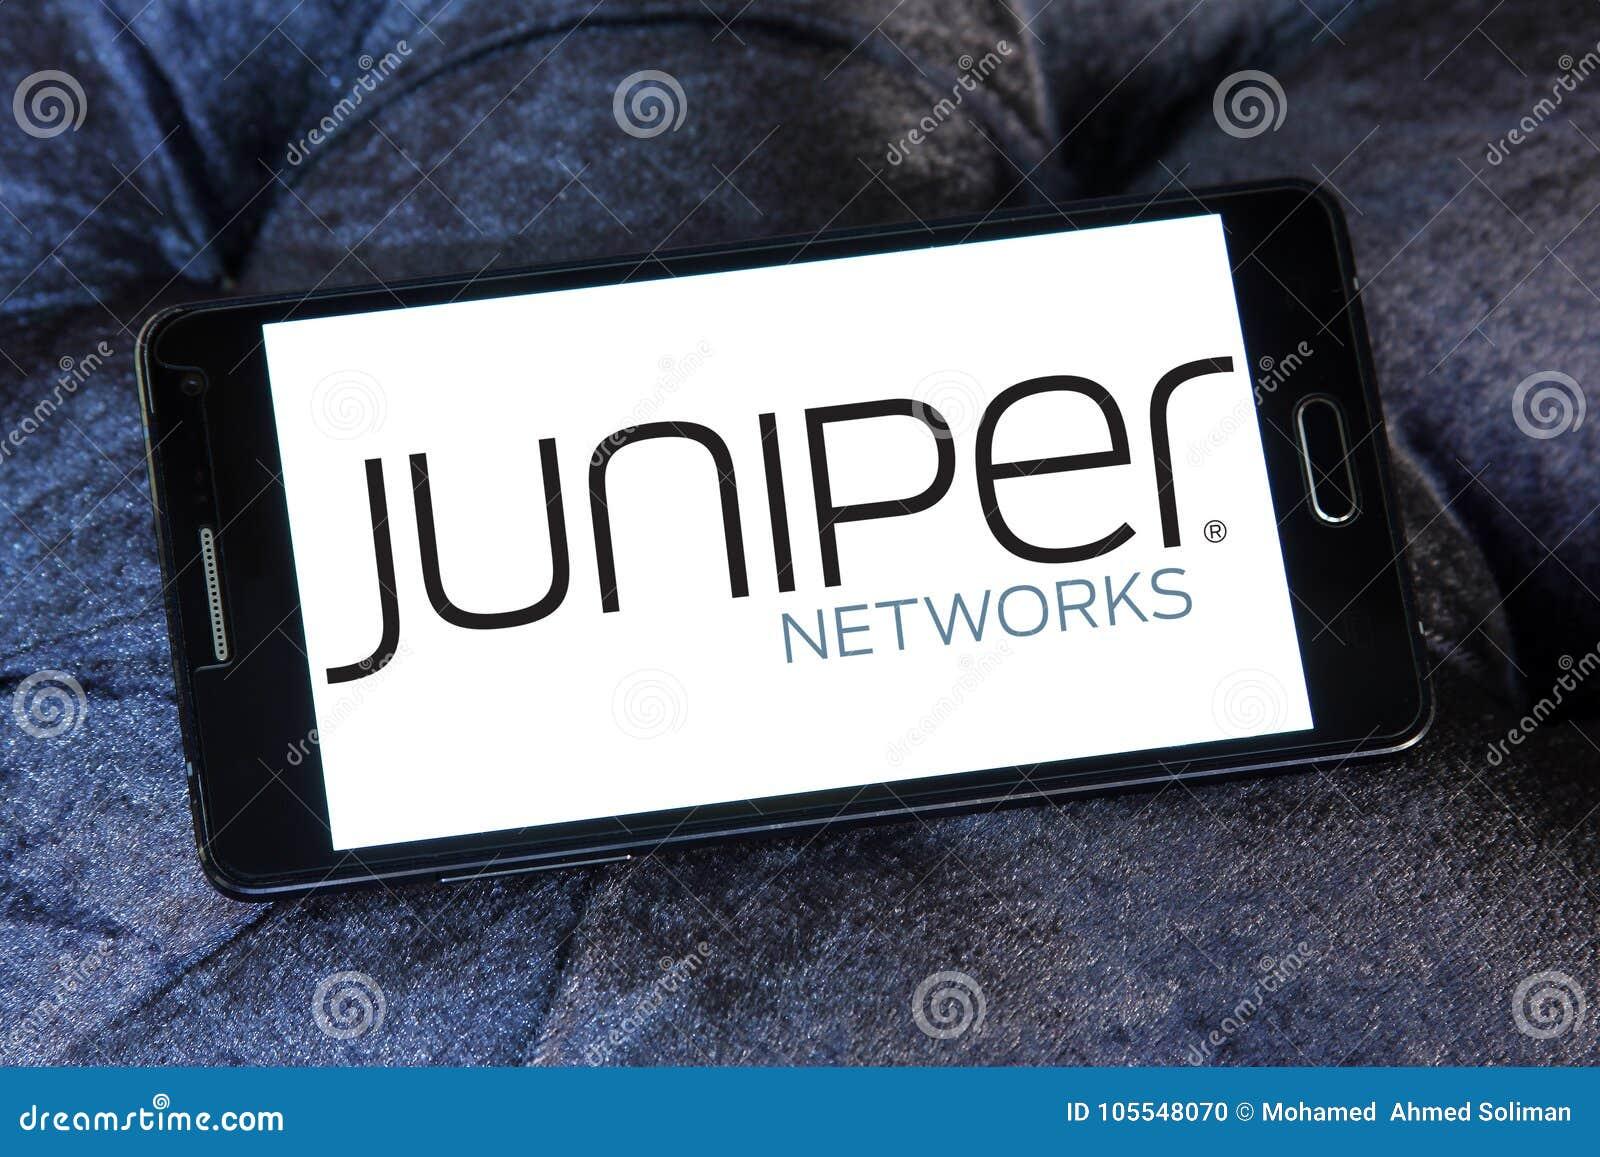 Juniper Networks Company Logo Editorial Image - Image of